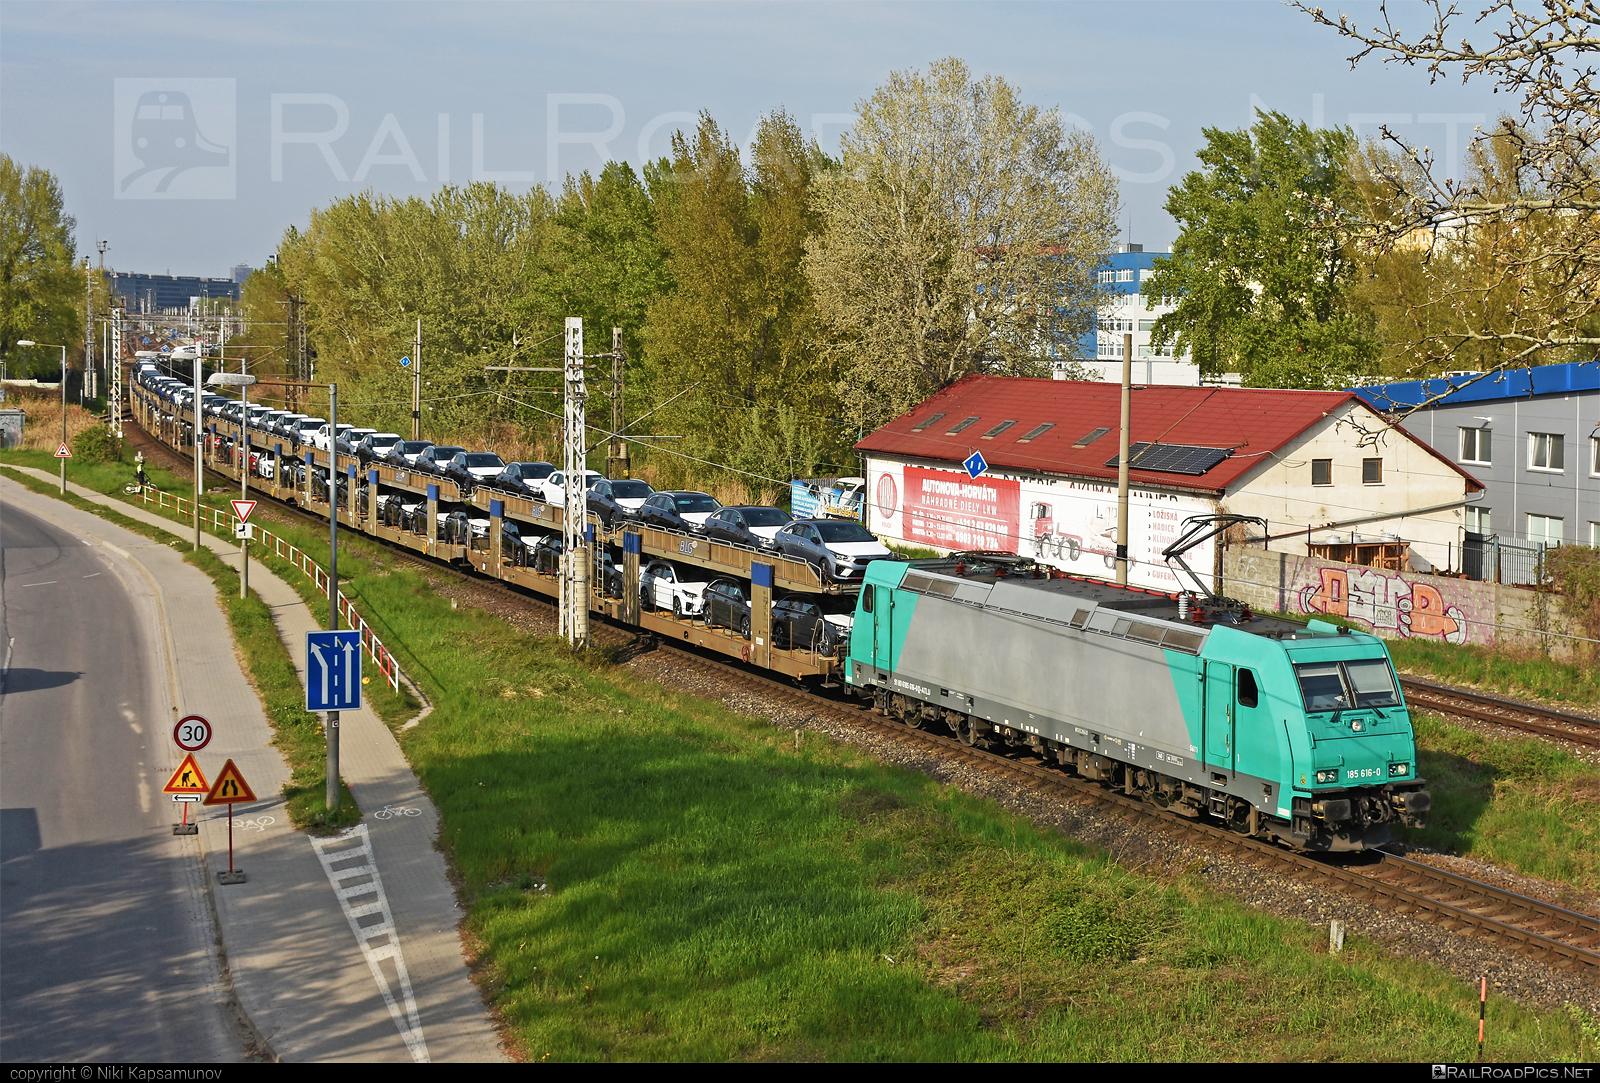 Bombardier TRAXX F140 AC2 - 185 616-0 operated by ecco-rail GmbH #alphatrainsluxembourg #blg #bombardier #bombardiertraxx #carcarrierwagon #eccorail #eccorailgmbh #traxx #traxxf140 #traxxf140ac #traxxf140ac2